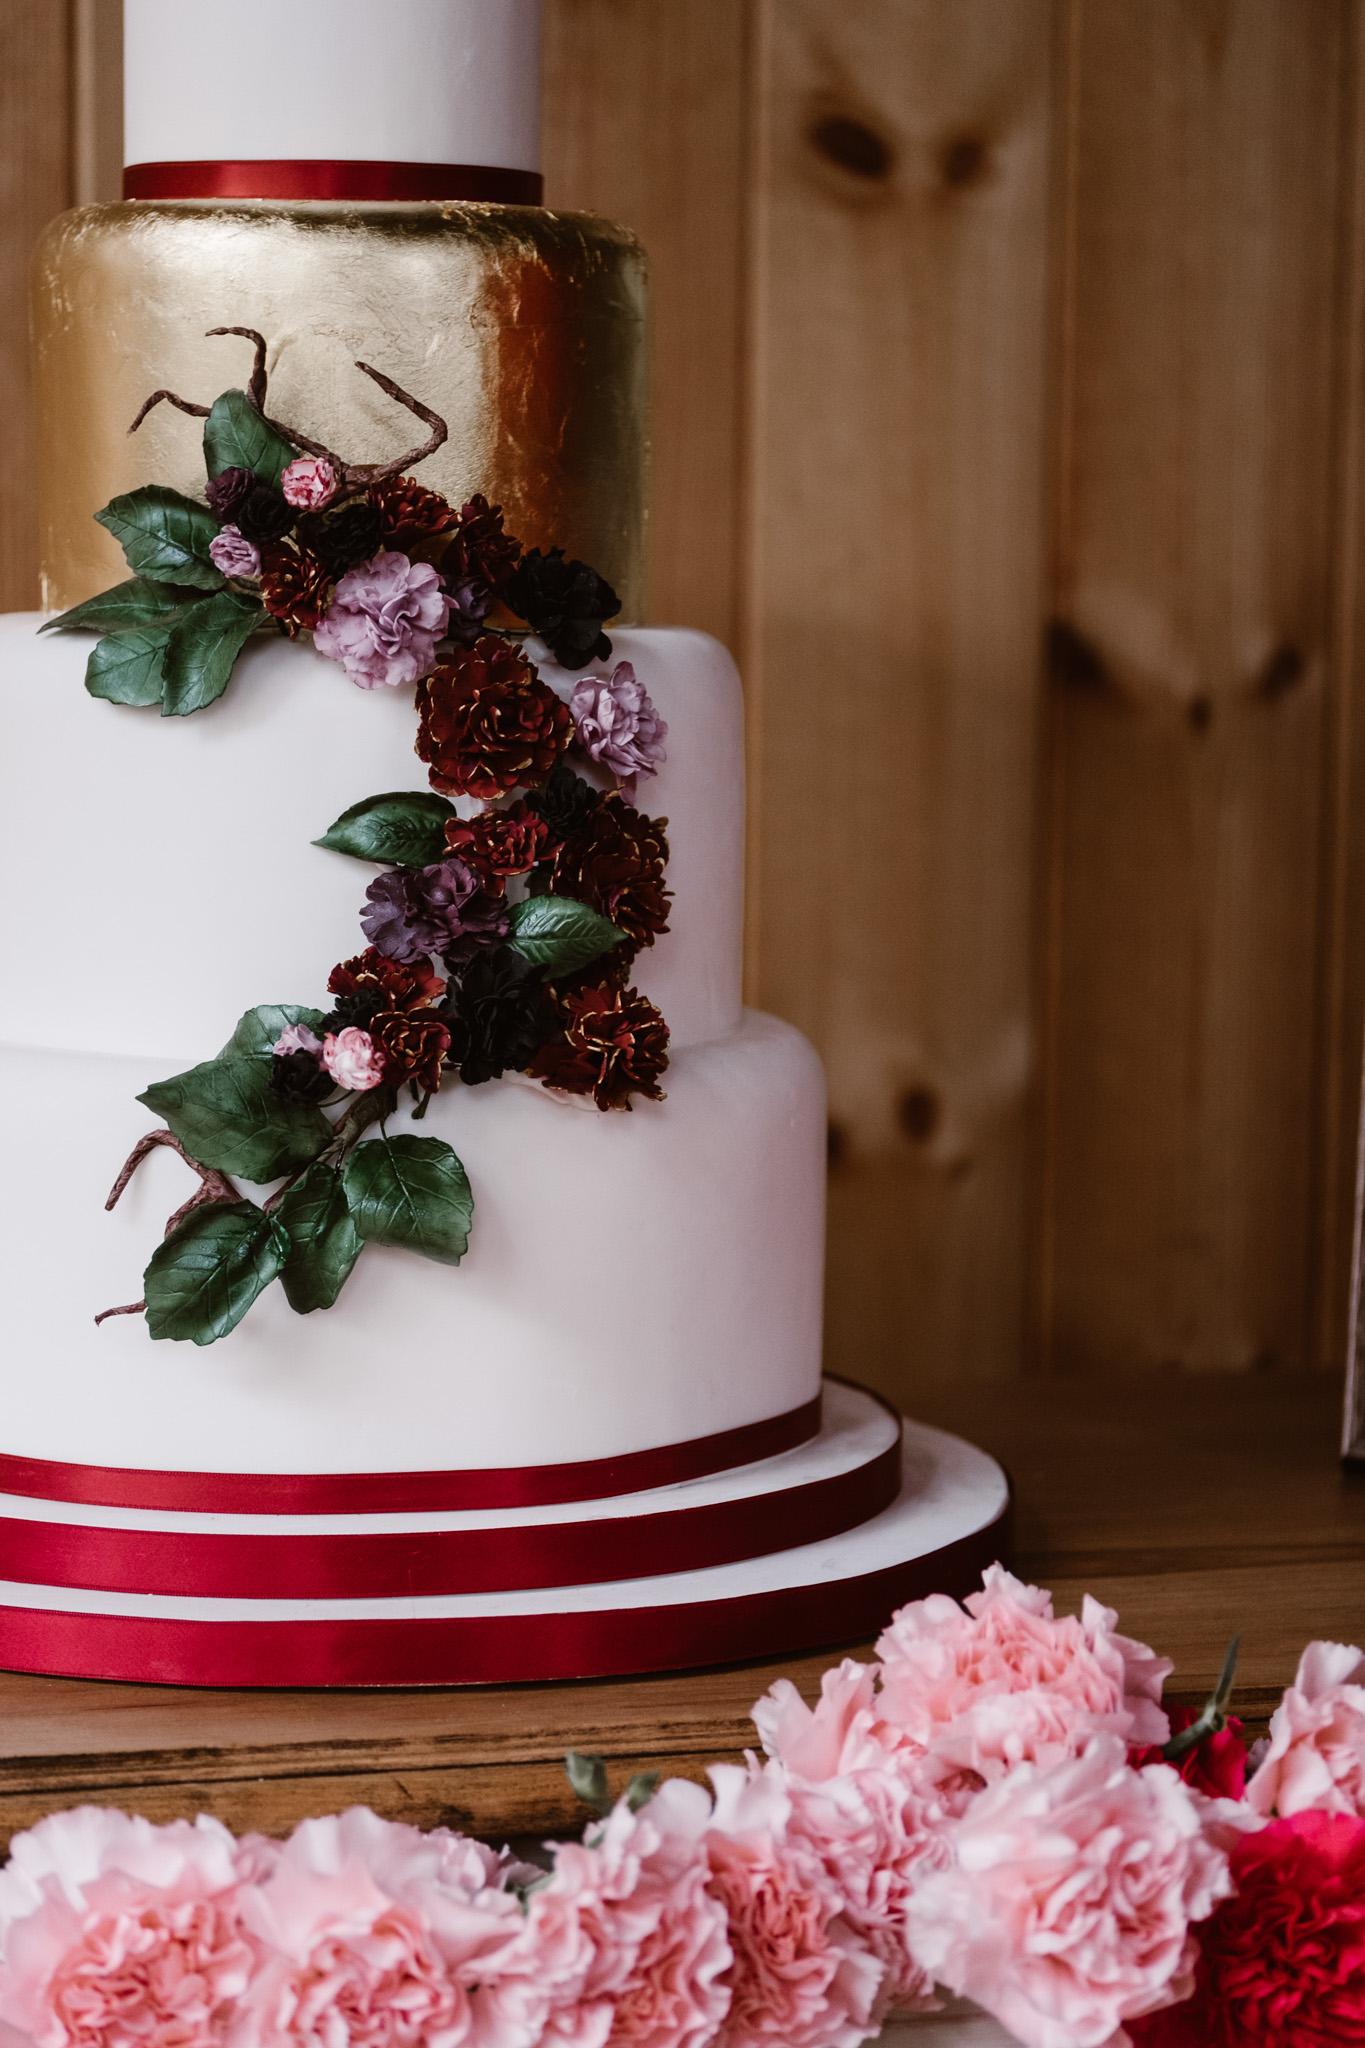 Captains-Wood-Barn-Alterative-Rustic-Vintage-Essex-Wedding-Suffolk-Grace-Elizabeth-28.jpg